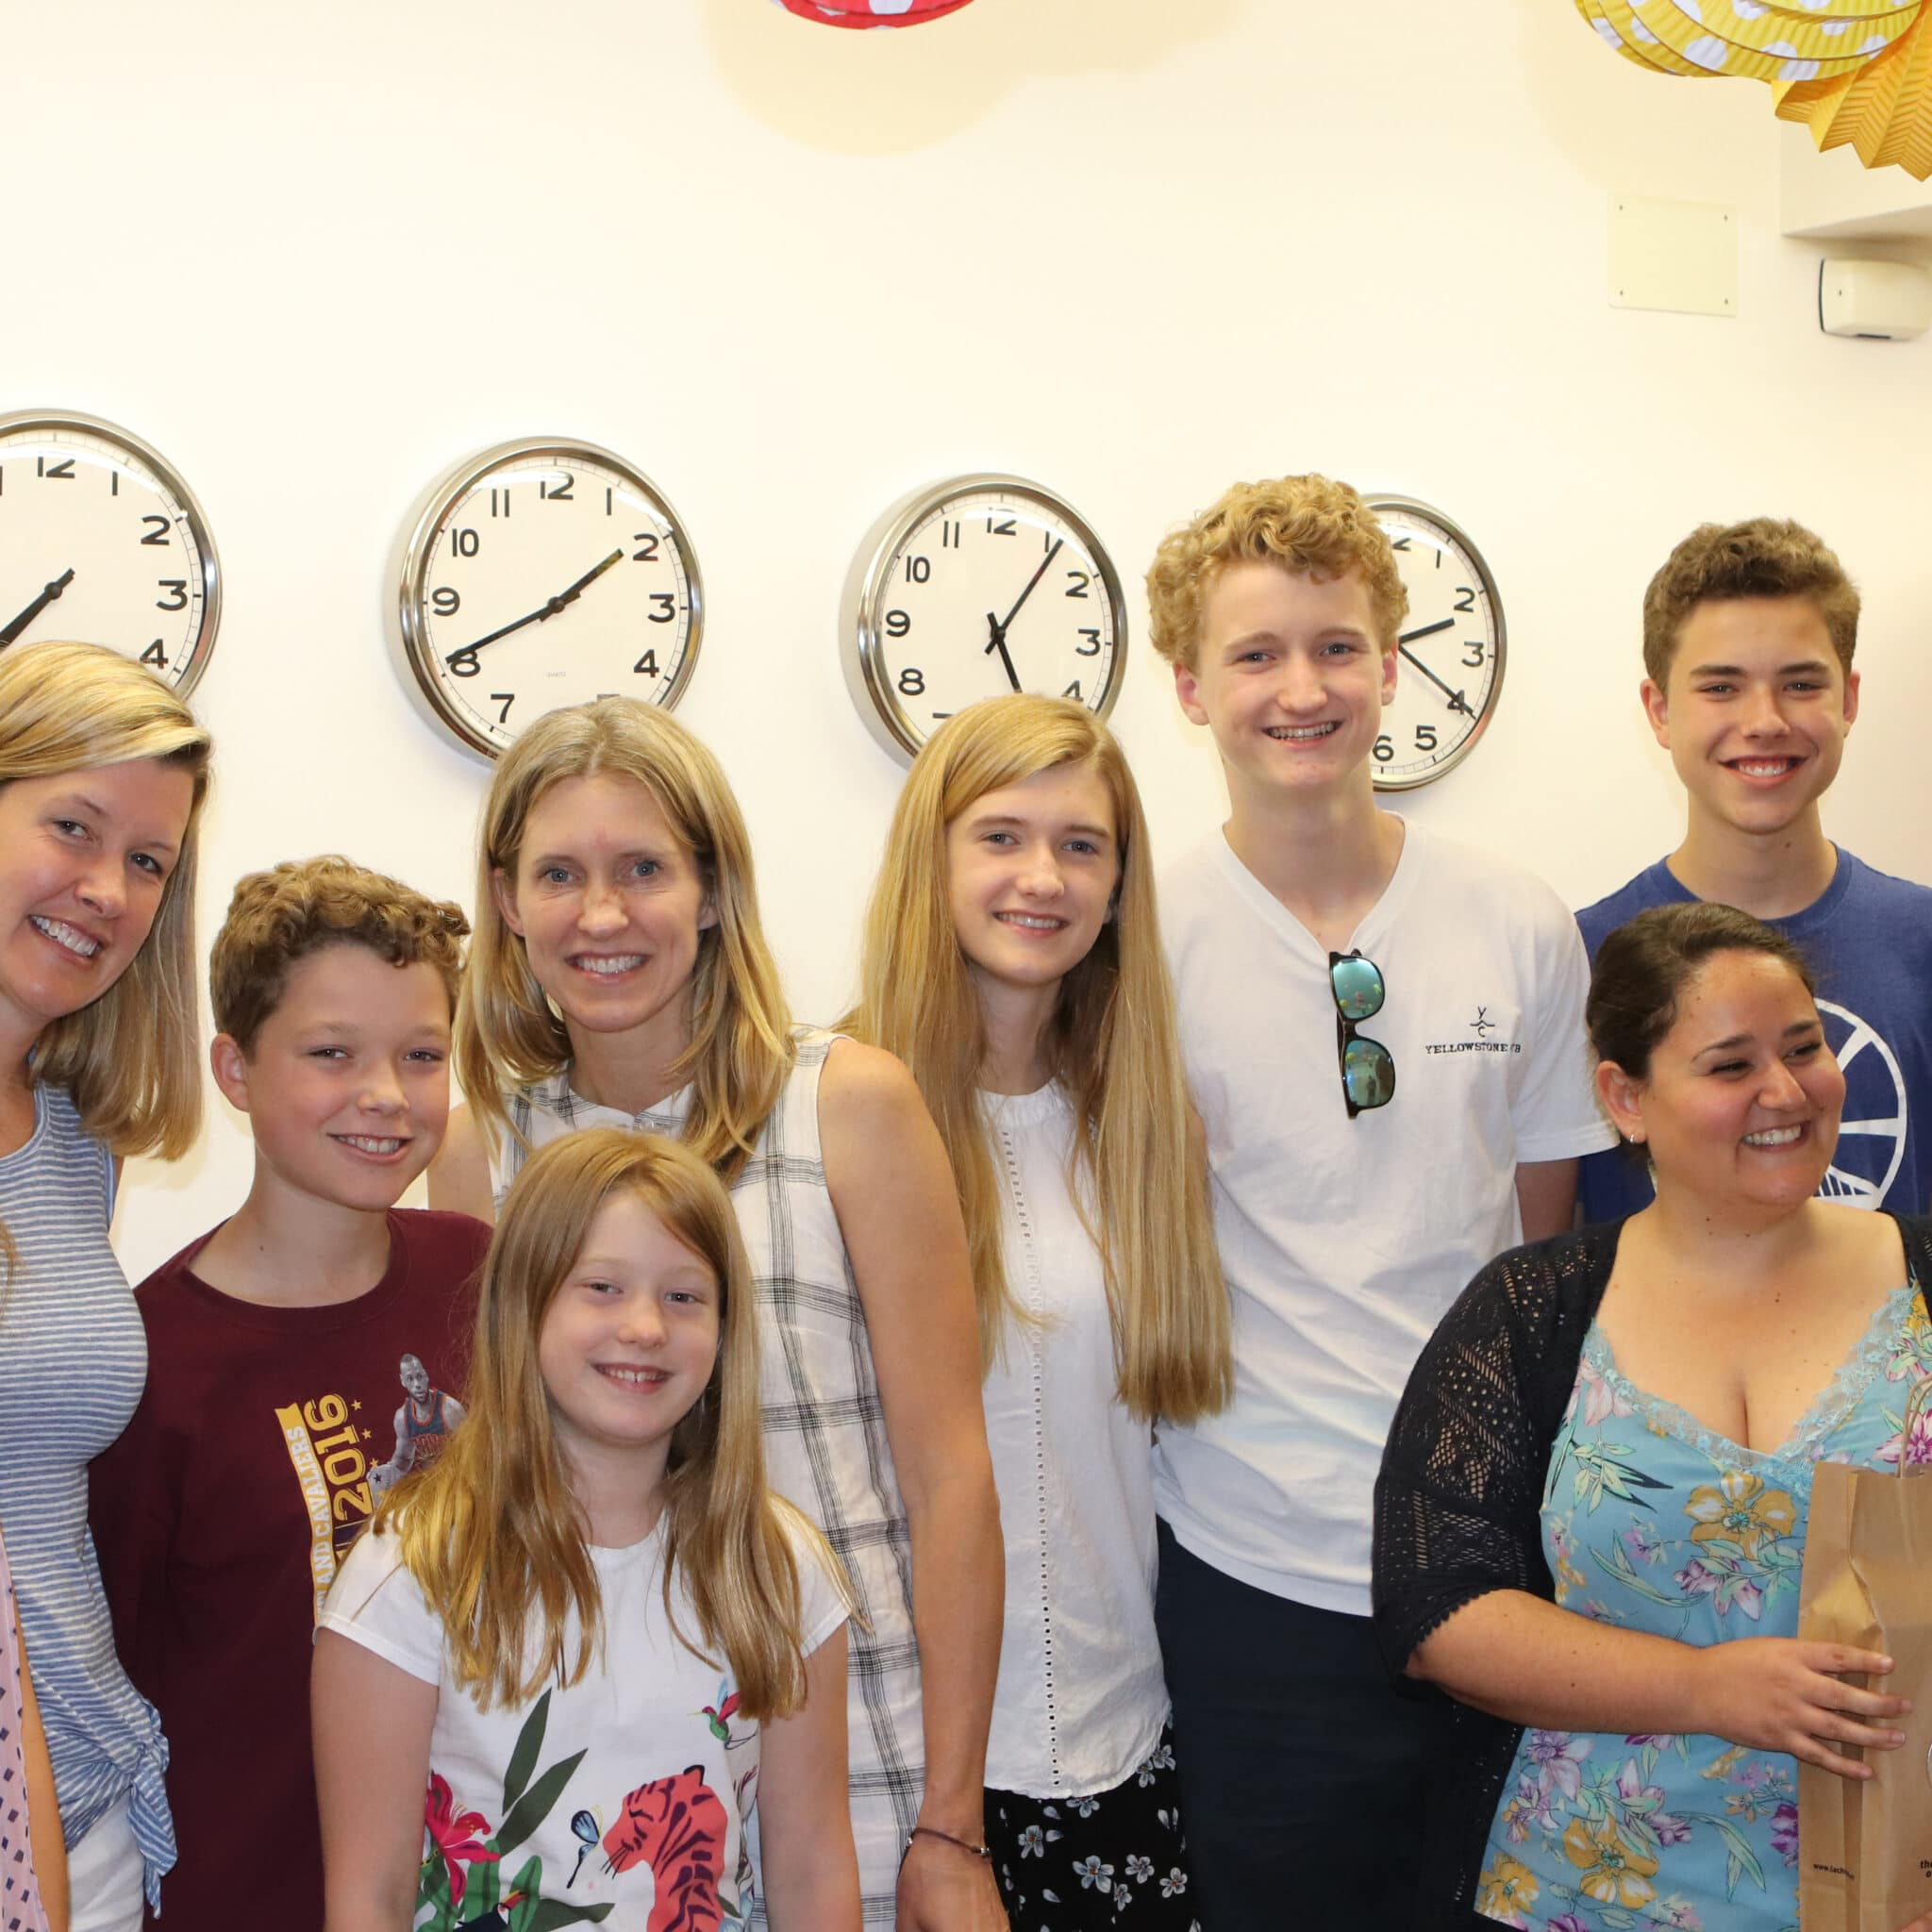 Spanish immersion program for families in Sevilla